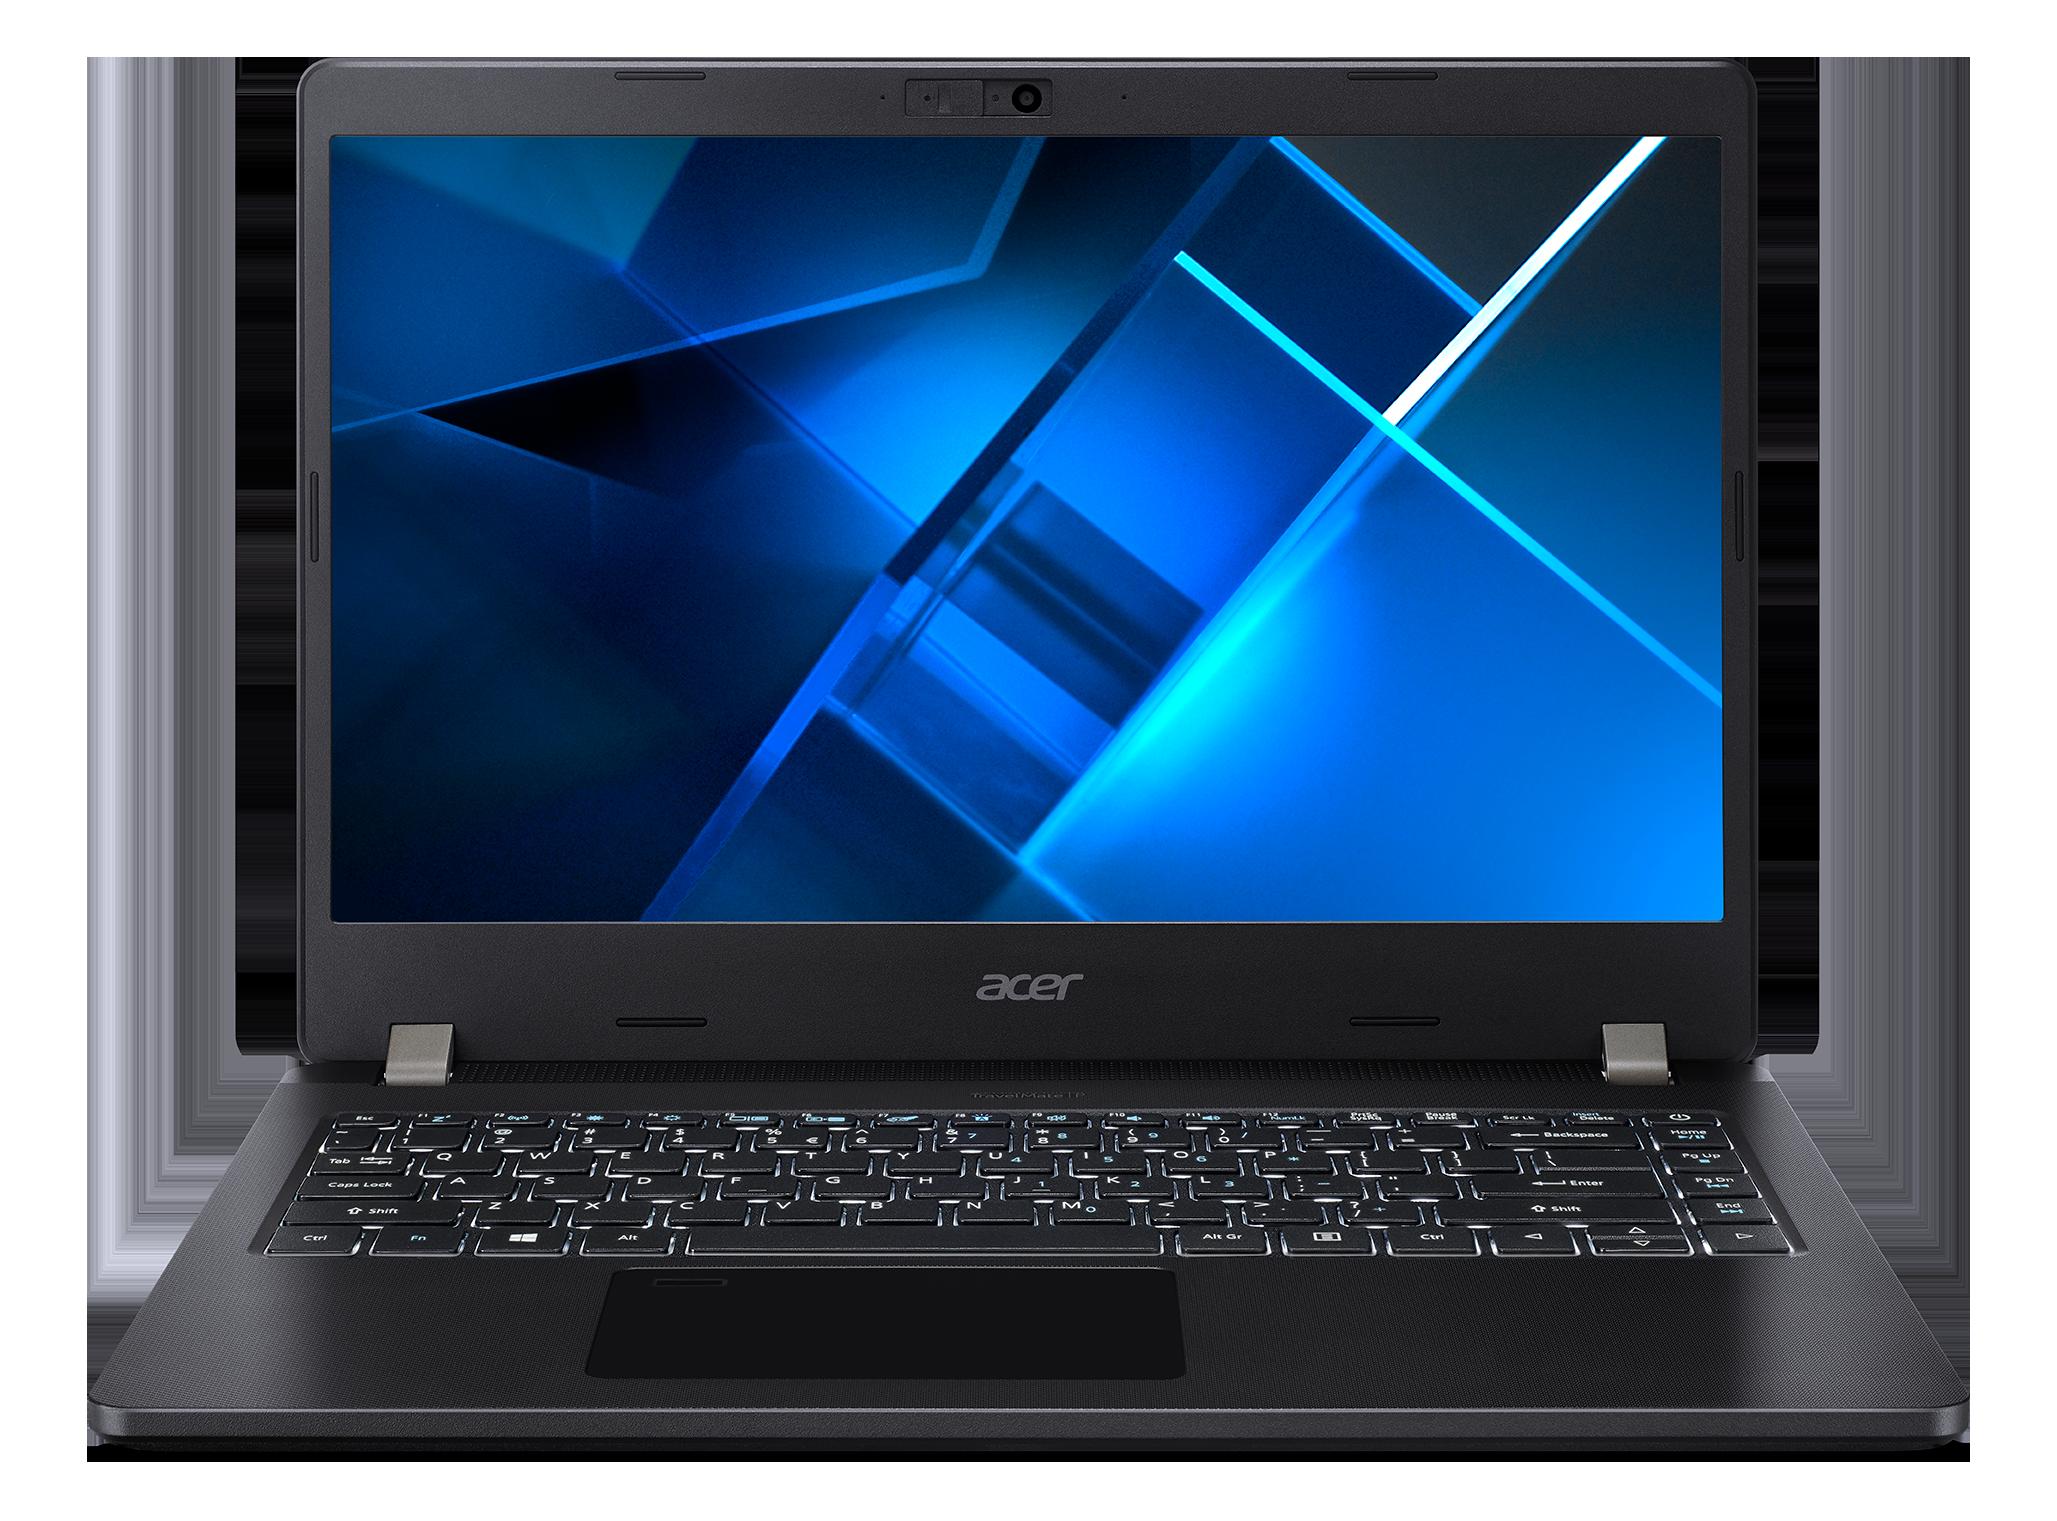 Acer TravelMate P2 (TMP214-53) - 14''/i7-1165G7/16G/512SSD/SmartCard/IPS/W10Po - NX.VQ4EC.003